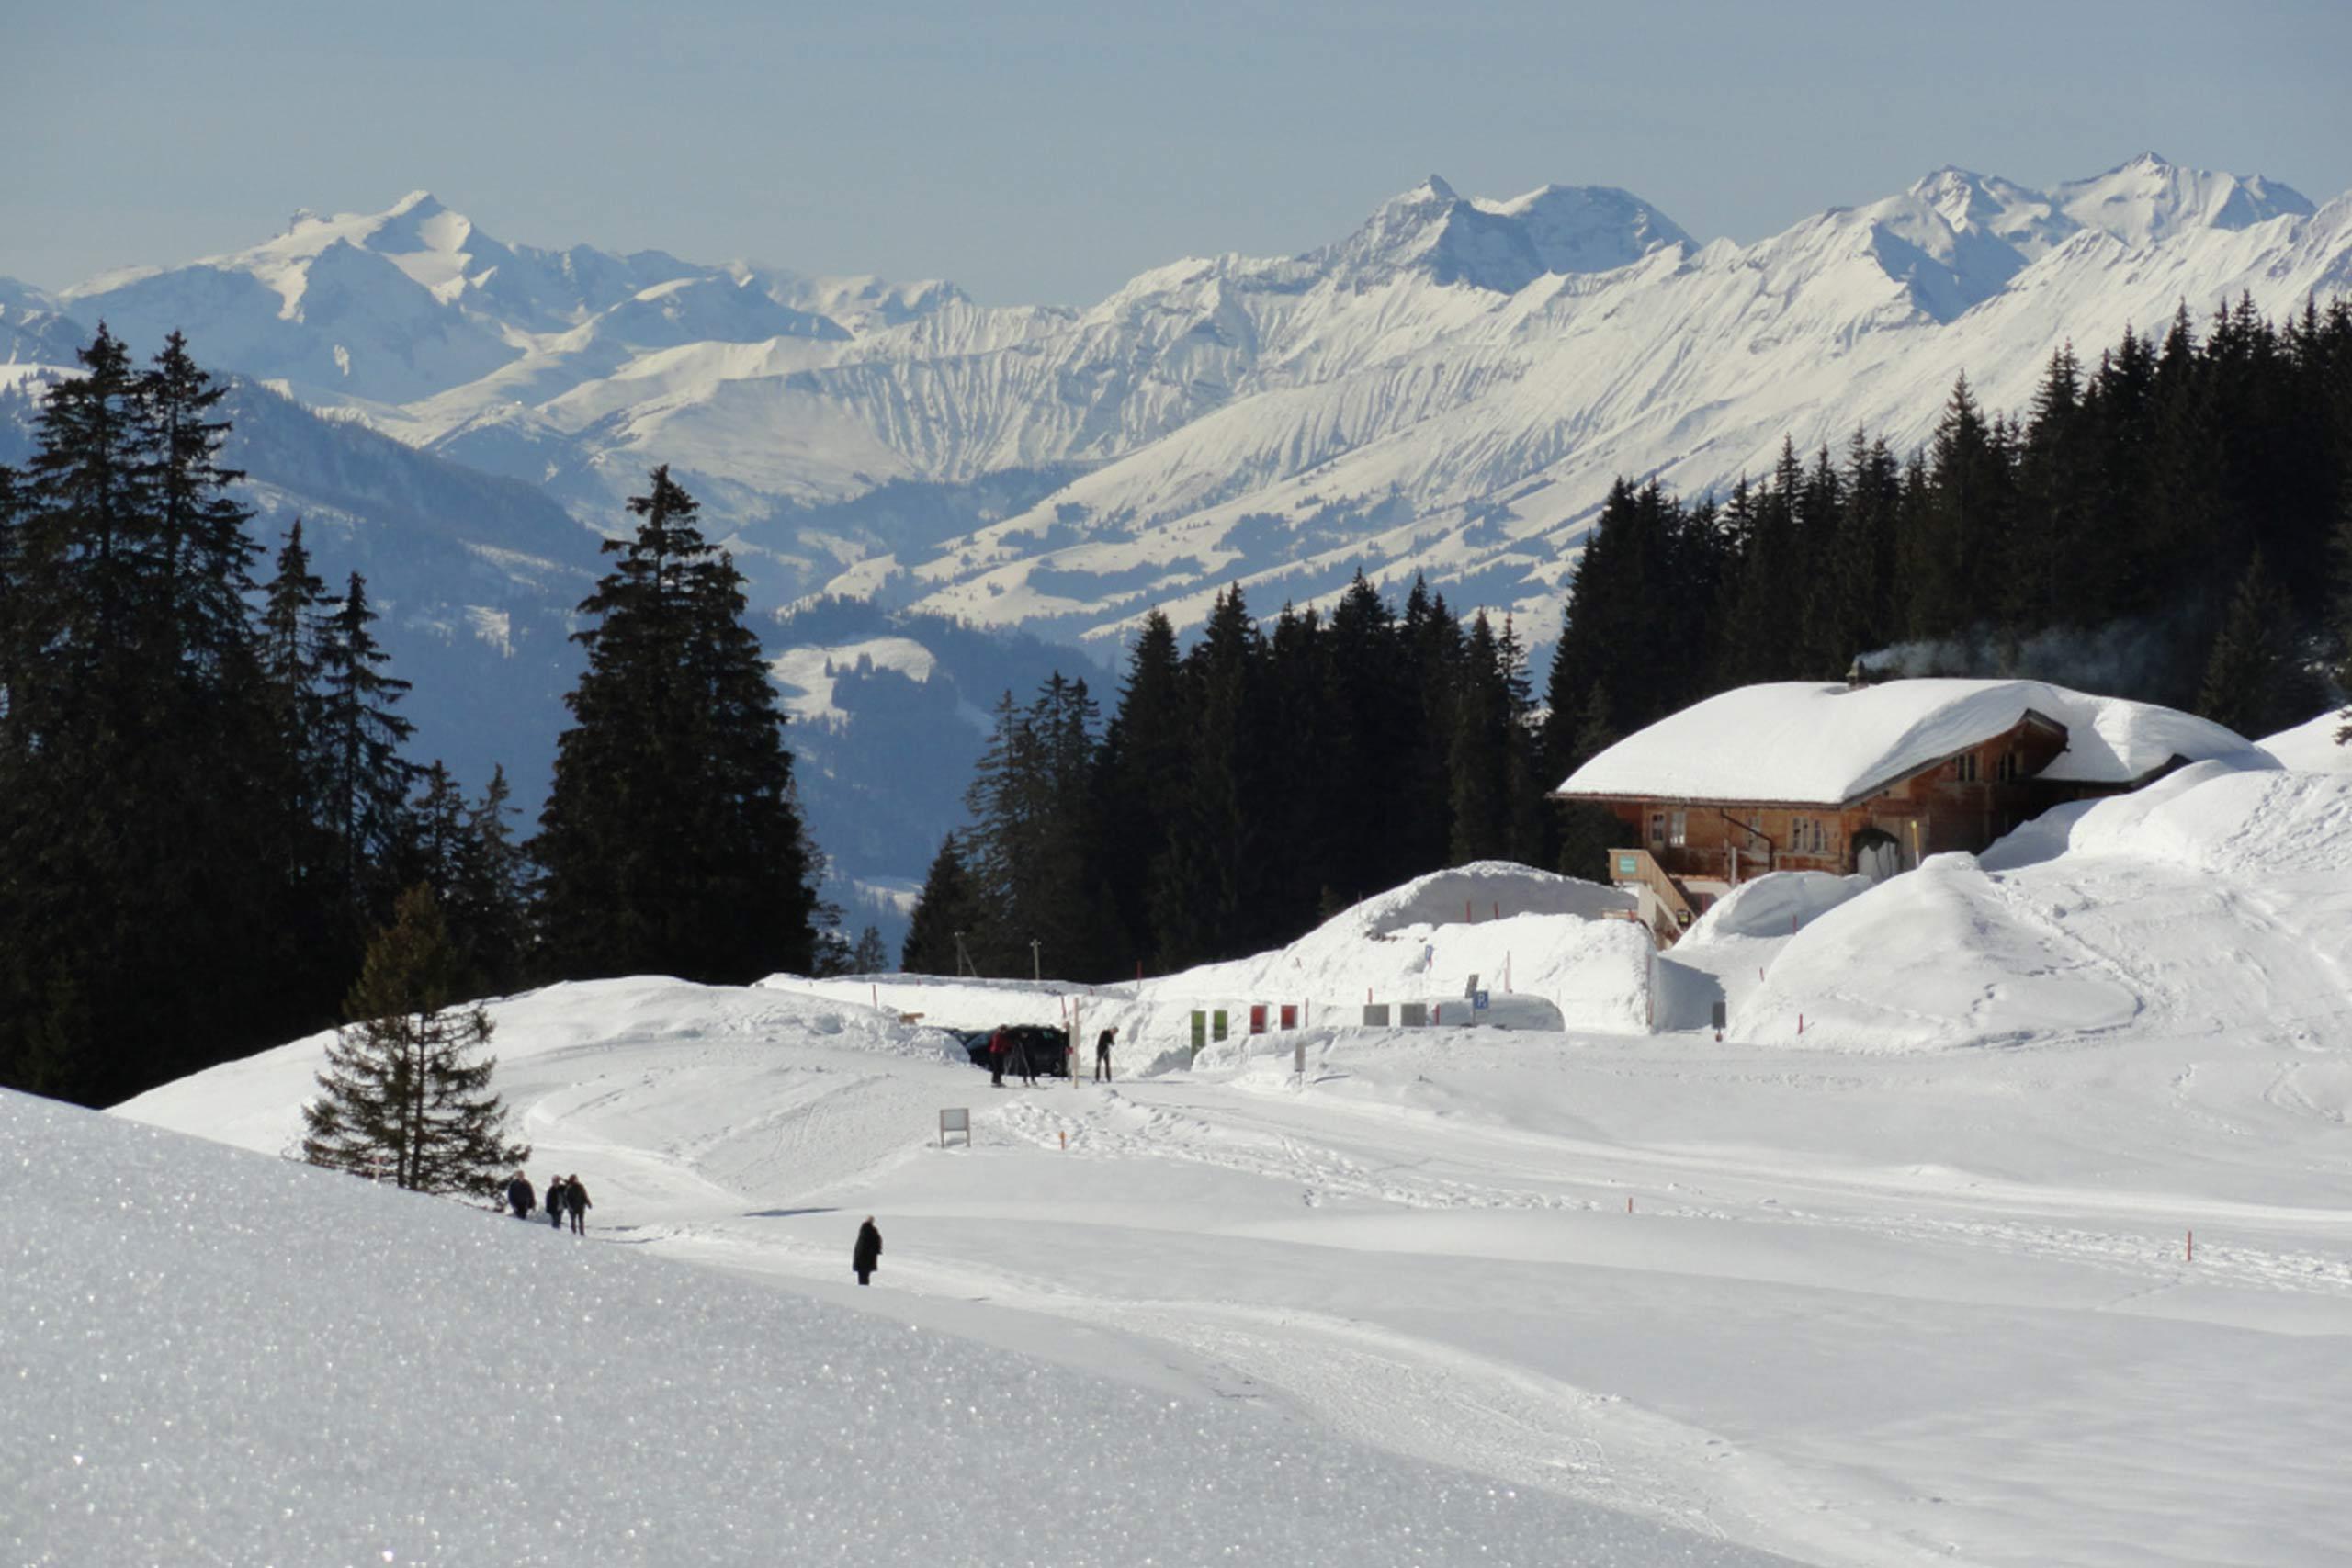 jaegerstuebli-lombachalp-winter-schnee-sonne.jpg